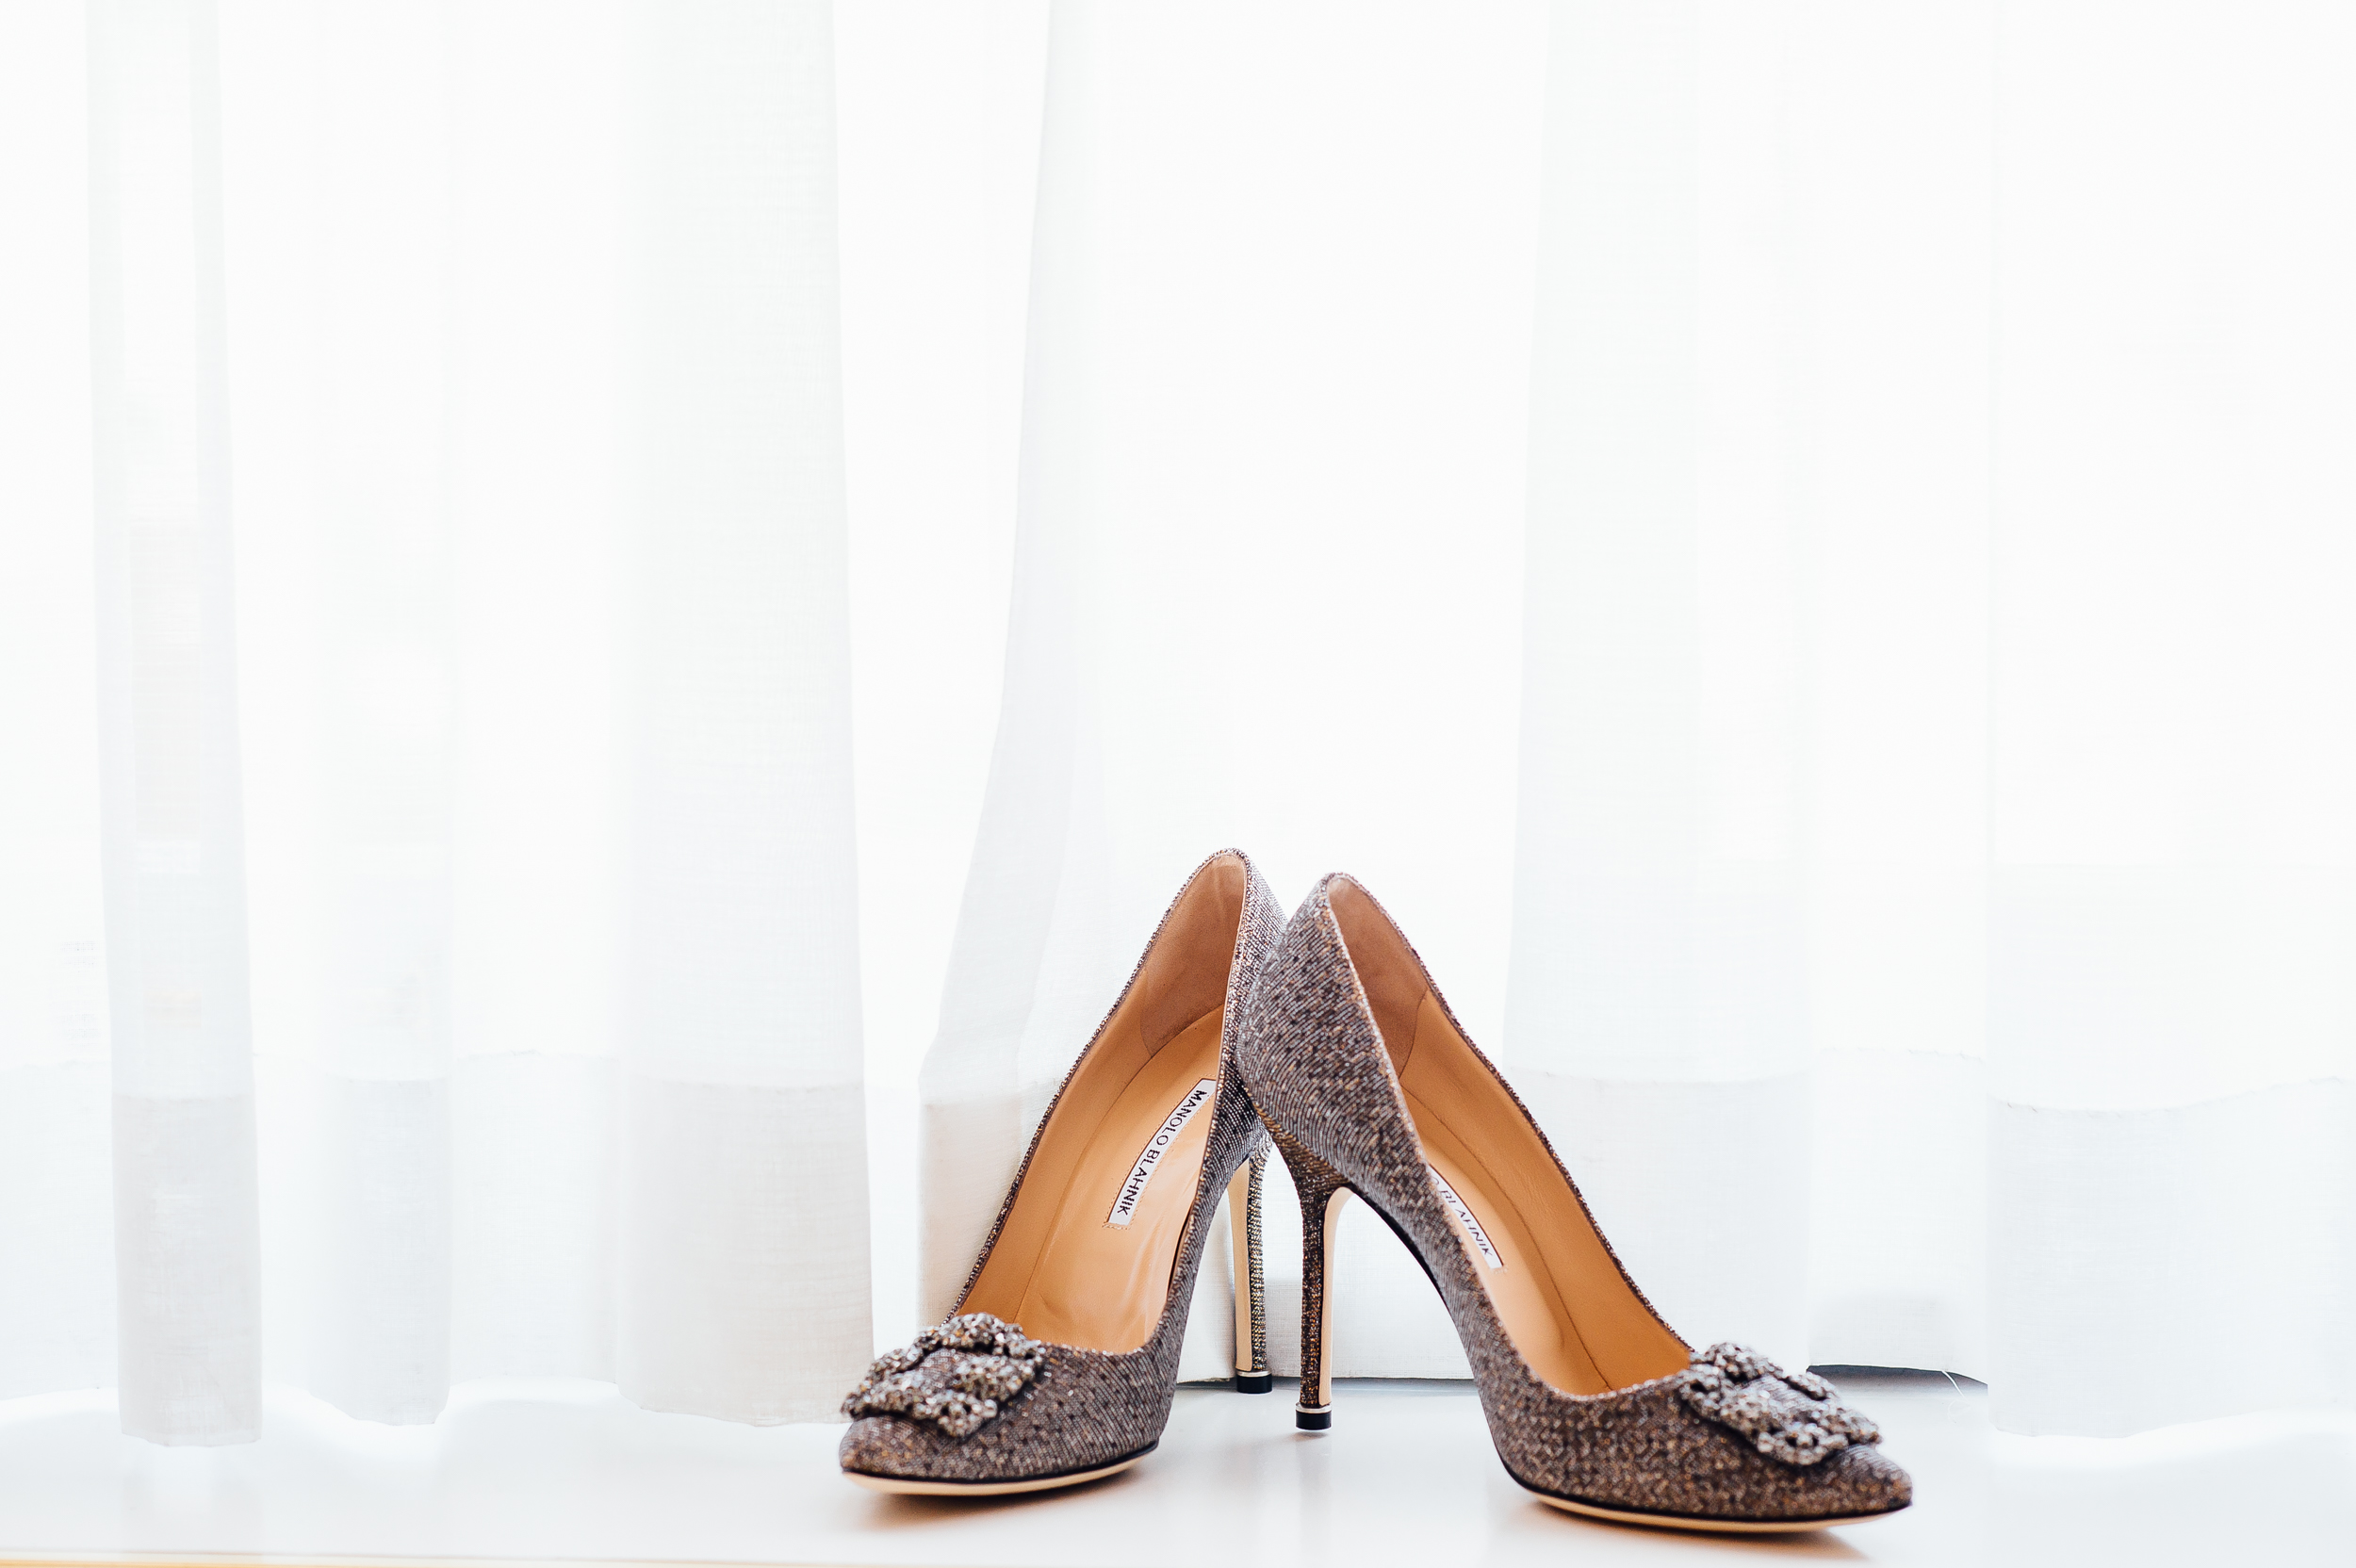 Manolo Blank wedding shoes